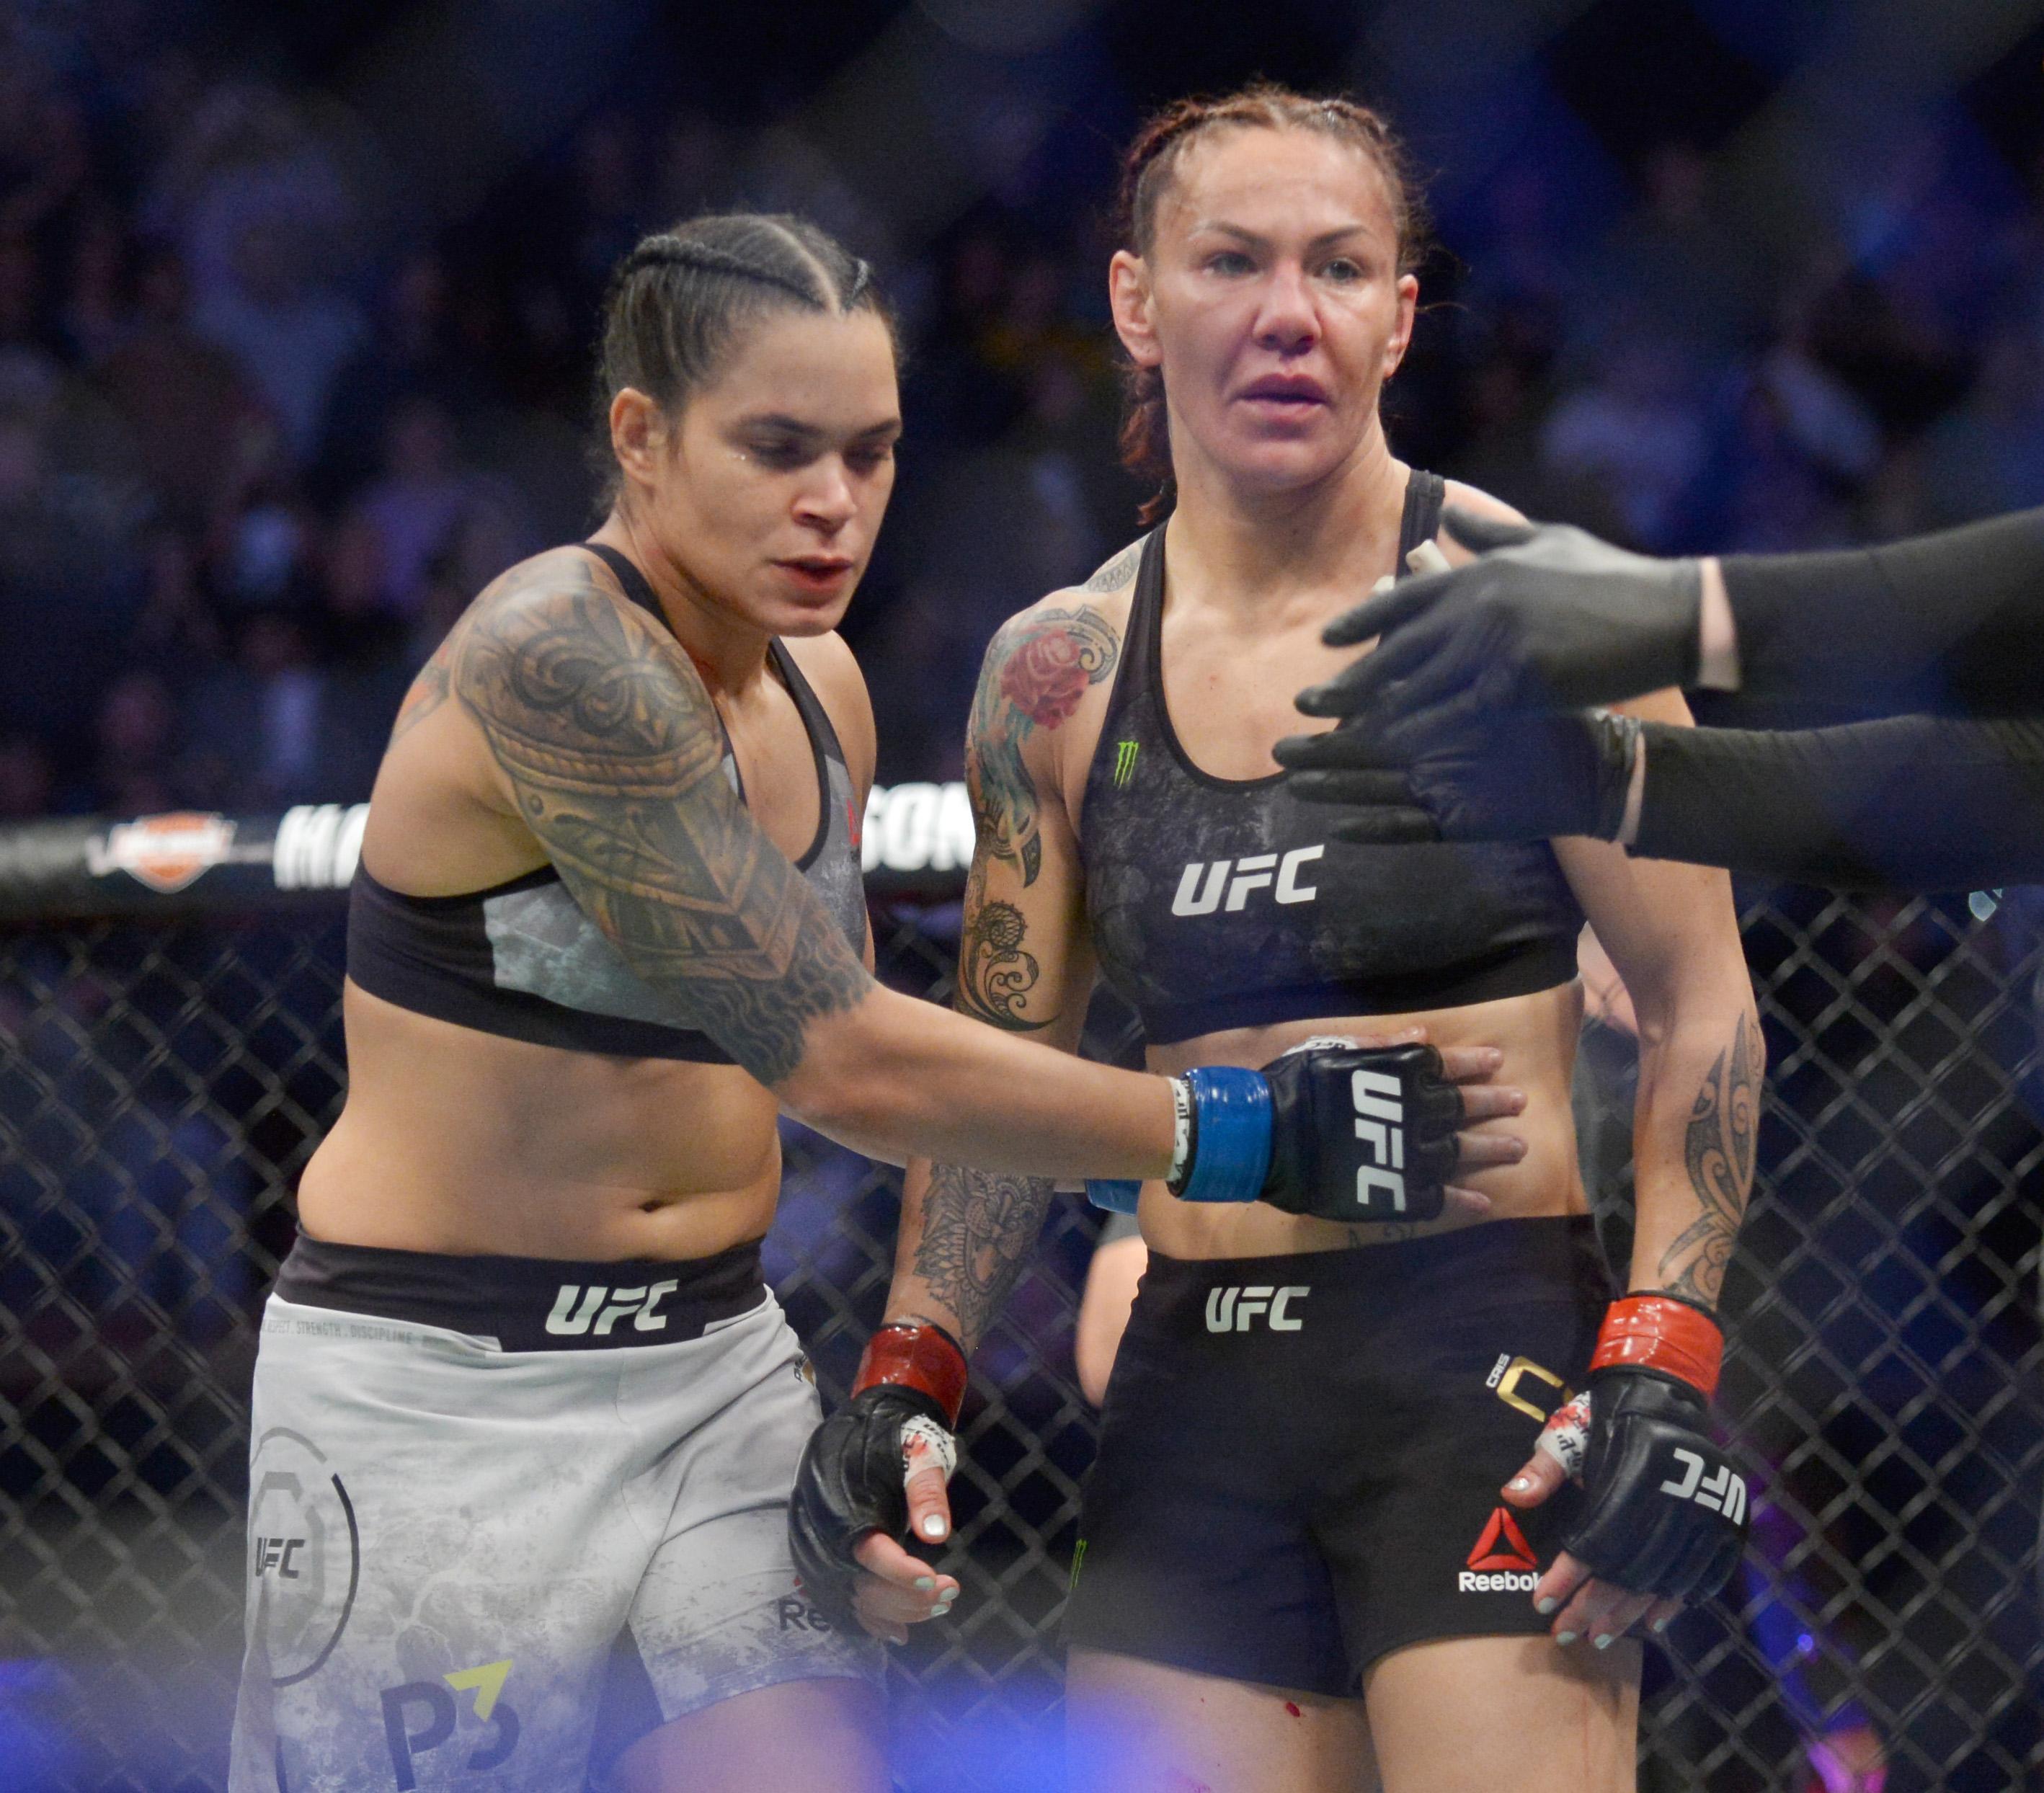 MMA: UFC 232-Cyborg vs Nunes